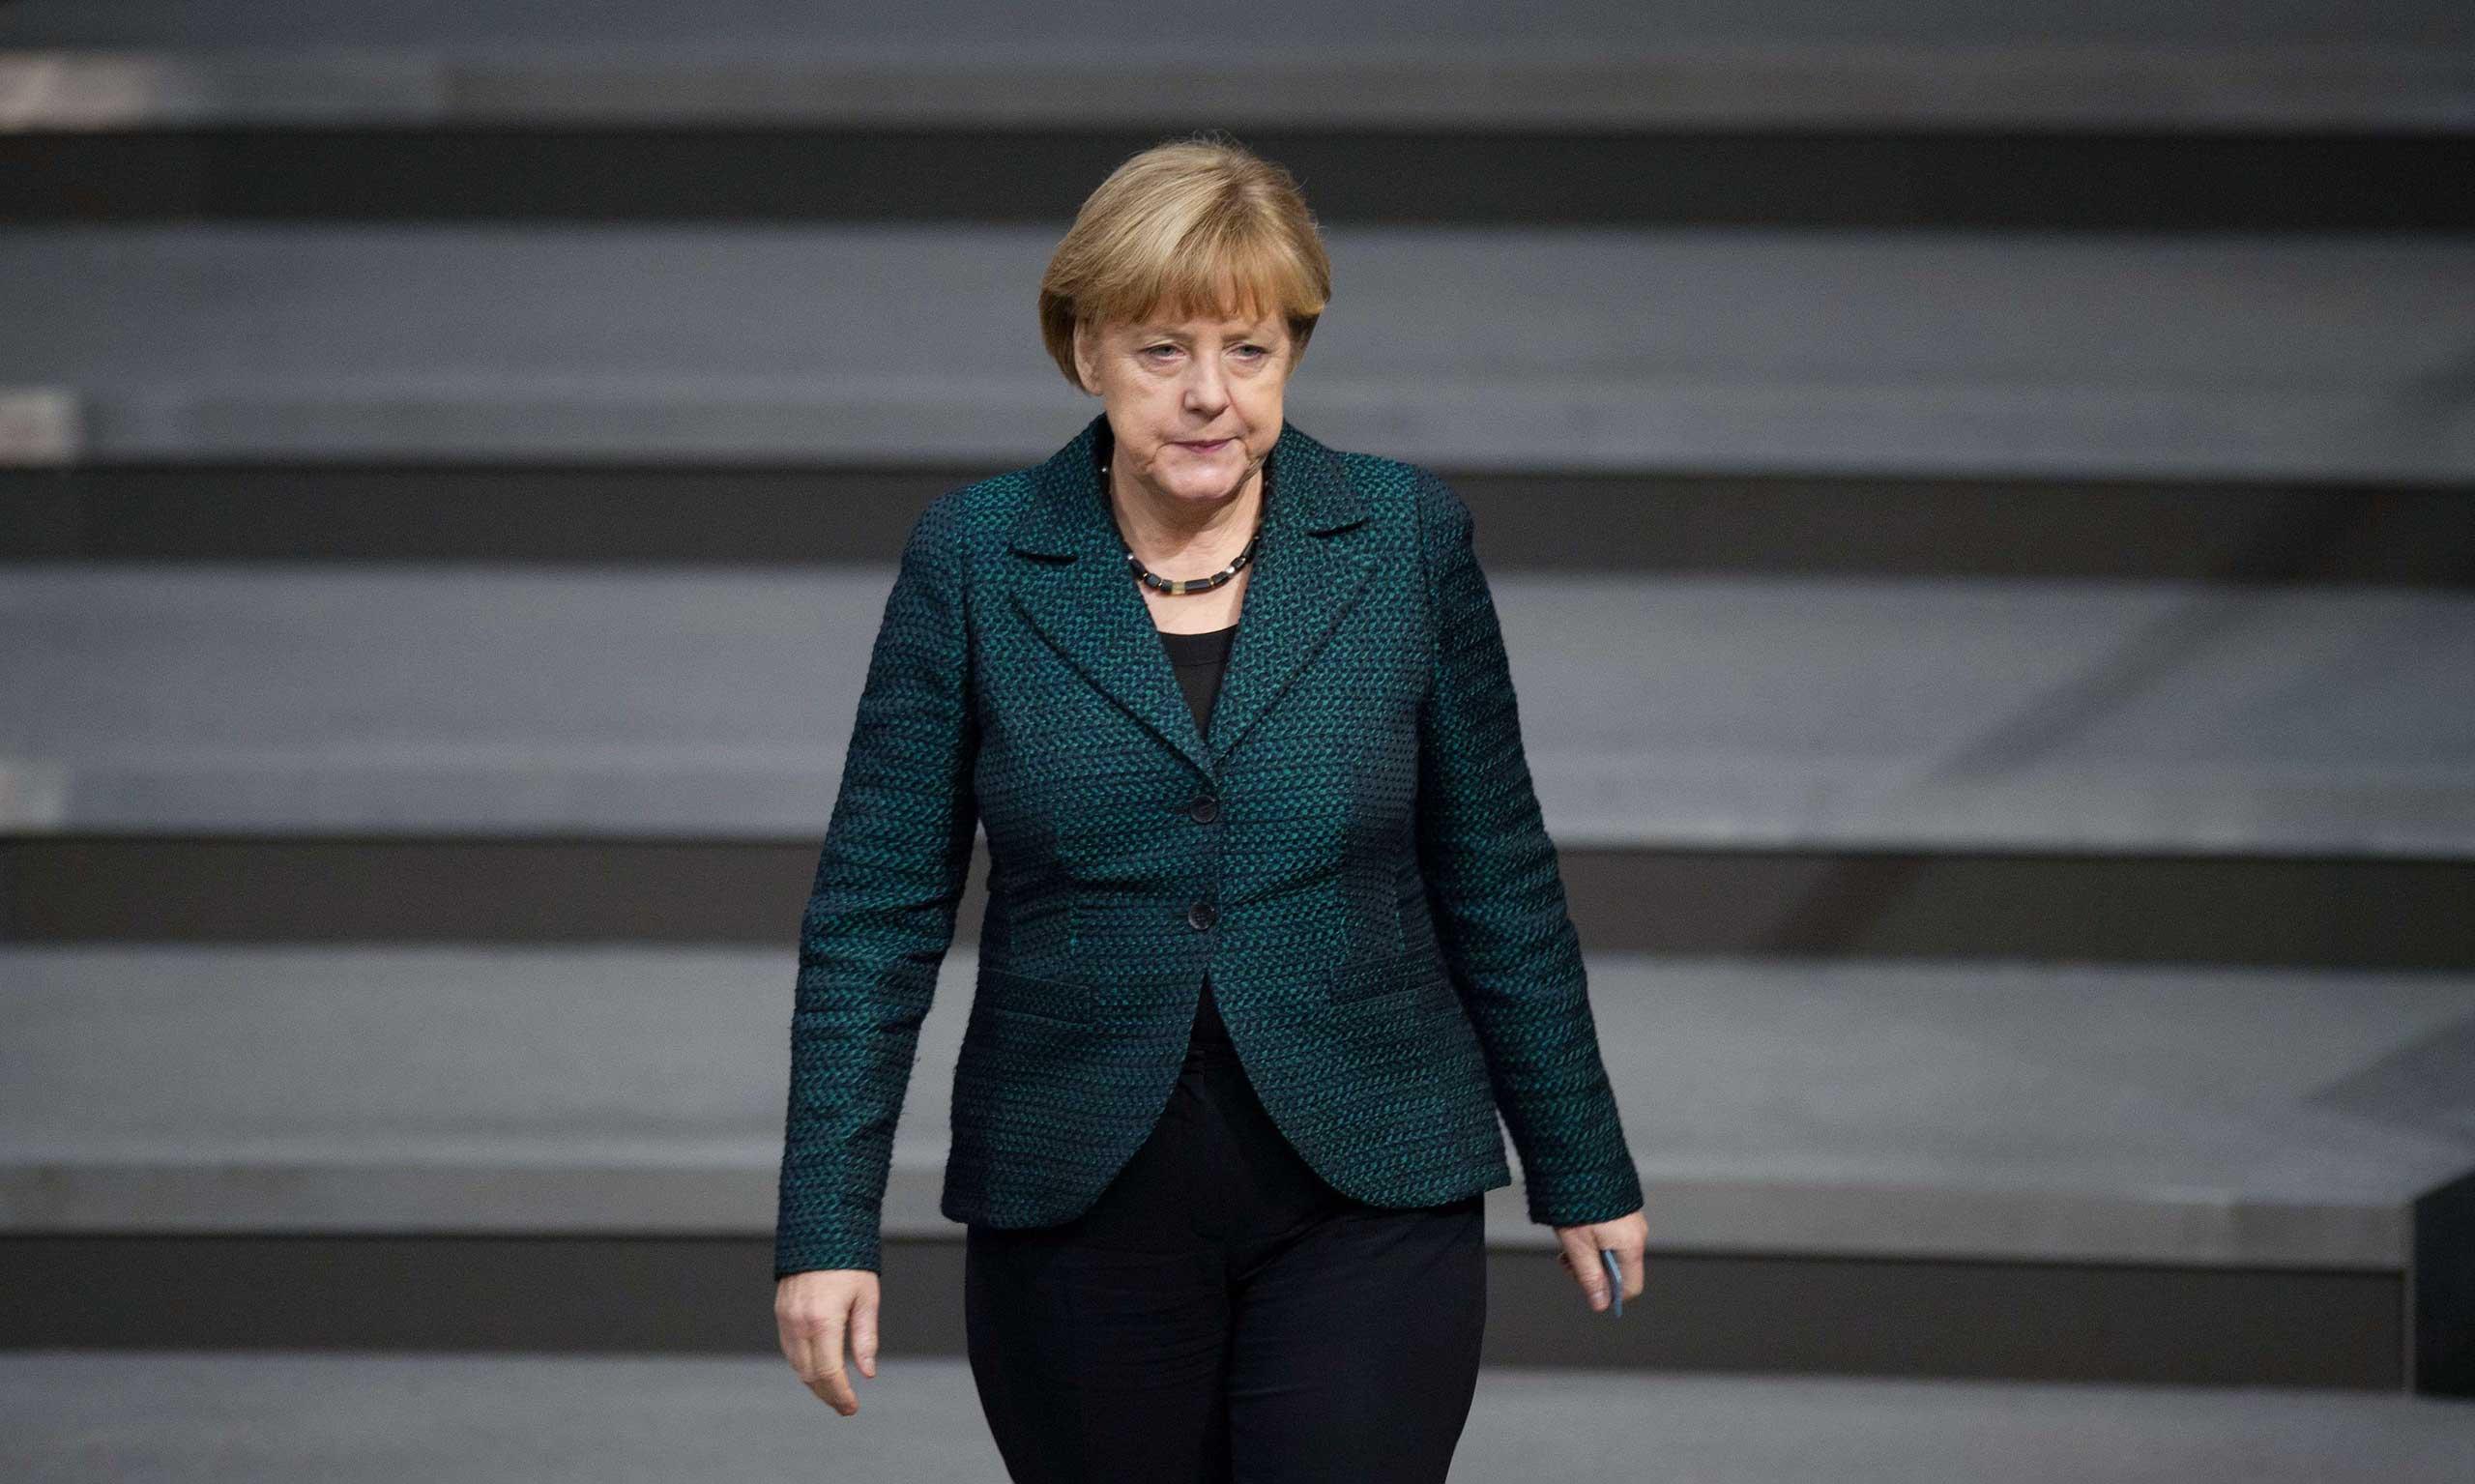 Chancellor Angela Merkel in the lower house of parliament Bundestag in Berlin, Nov. 26, 2014.